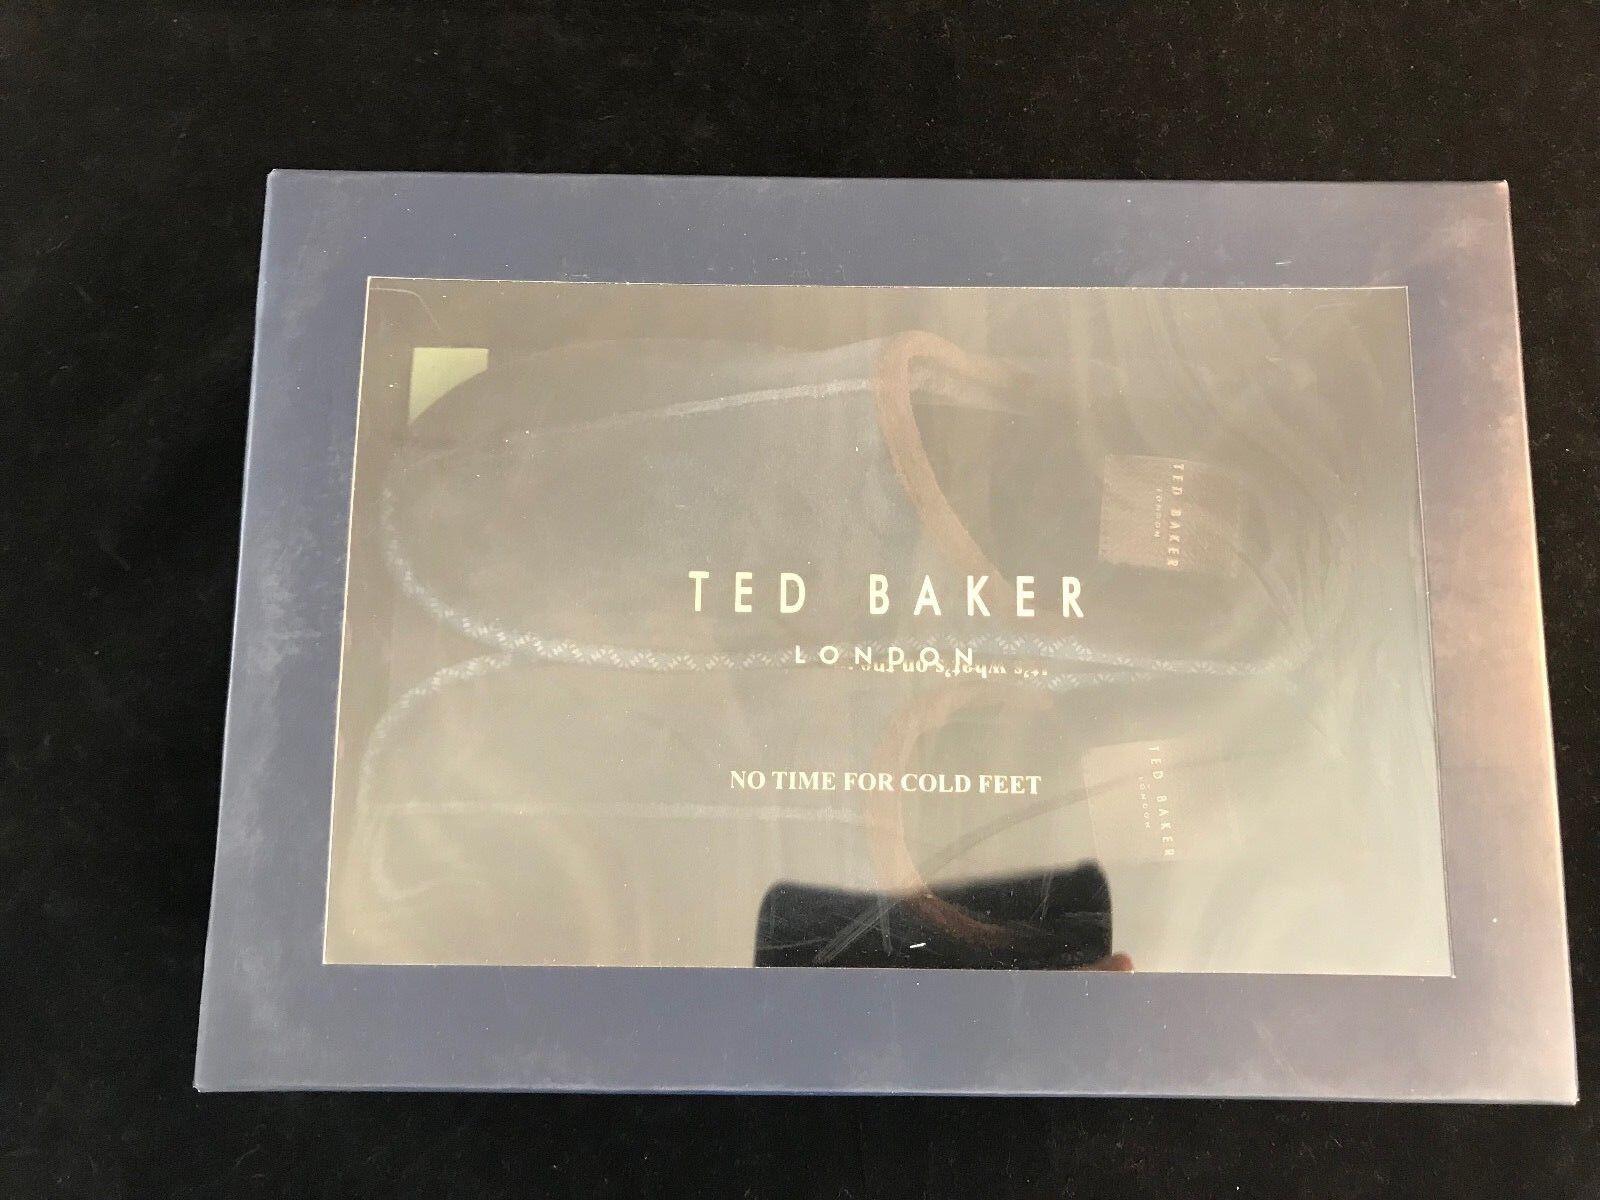 BNIB TED BAKER Dark Blau Youngi 2 9 Suede Slippers. Größe UK 9 2  Gift Idea 68ae01